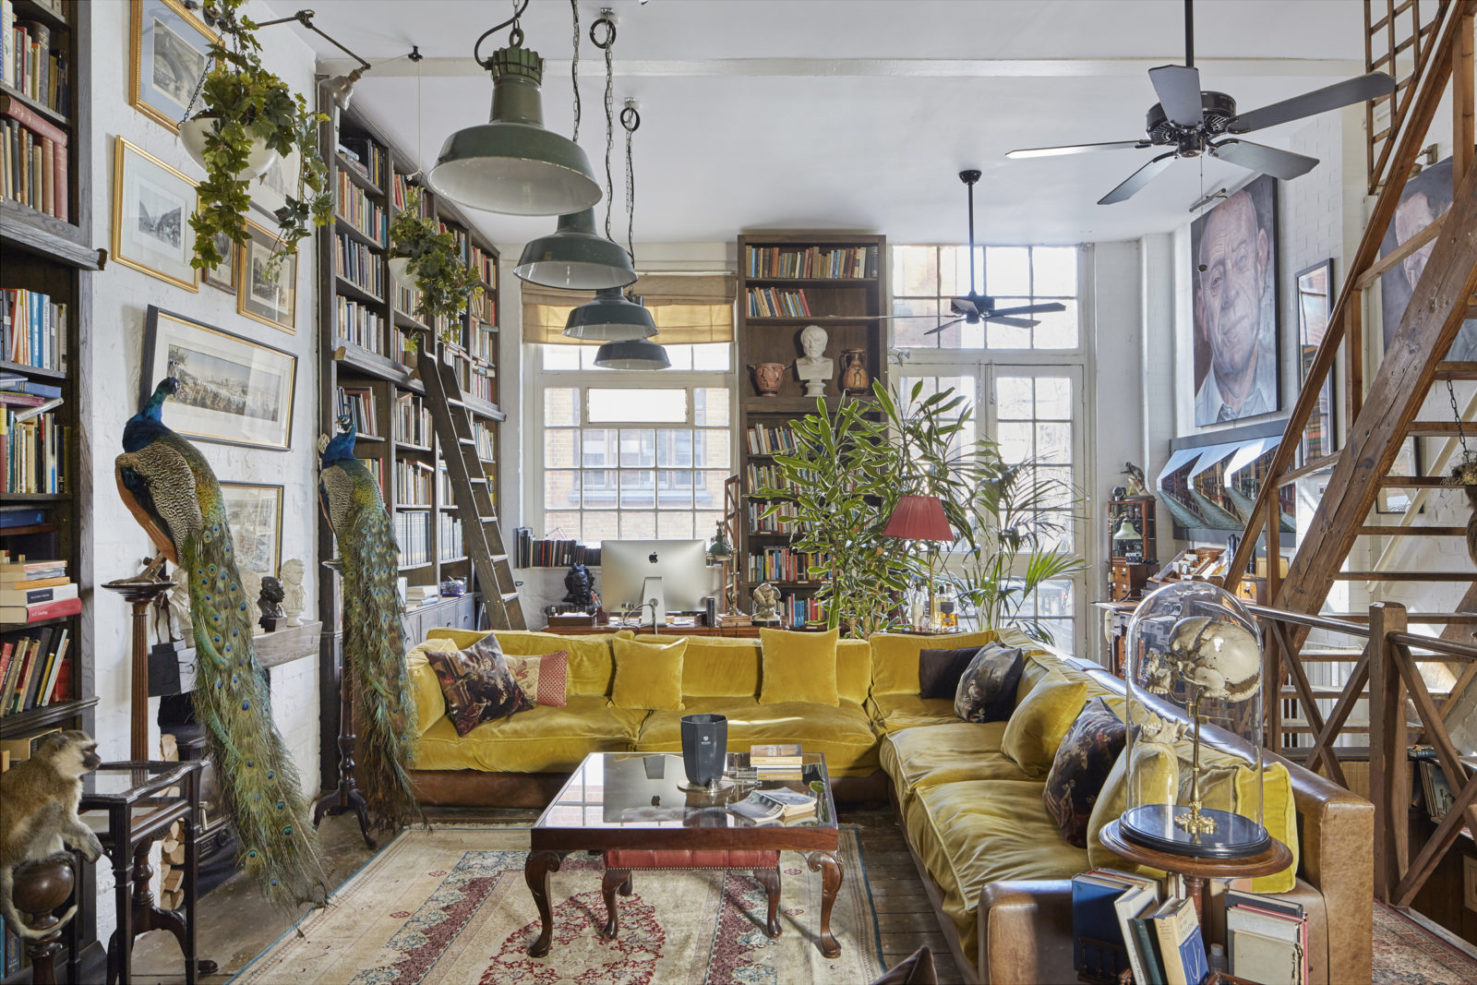 home library shelves and stuffed peacocks